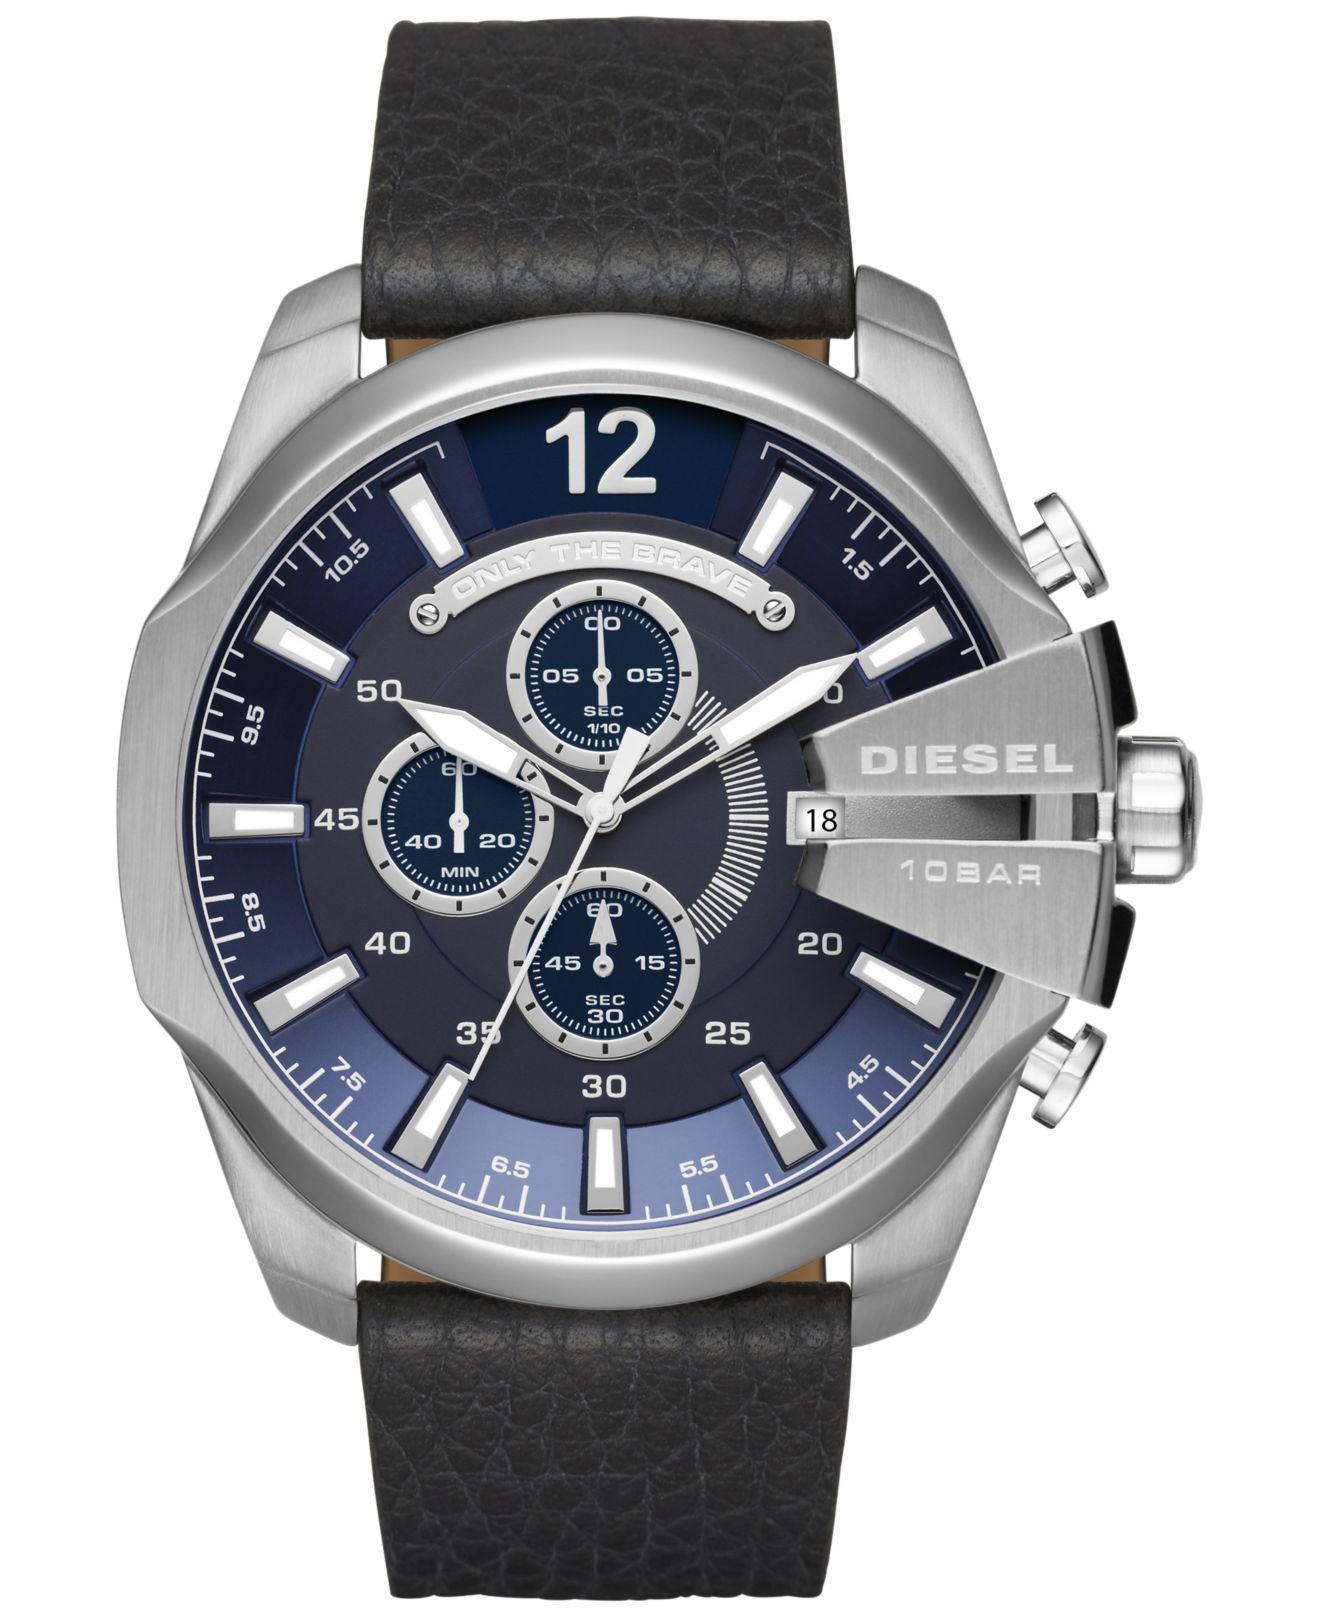 a6959228ec3 Lyst - DIESEL Men s Chronograph Mega Chief Black Leather Strap Watch ...